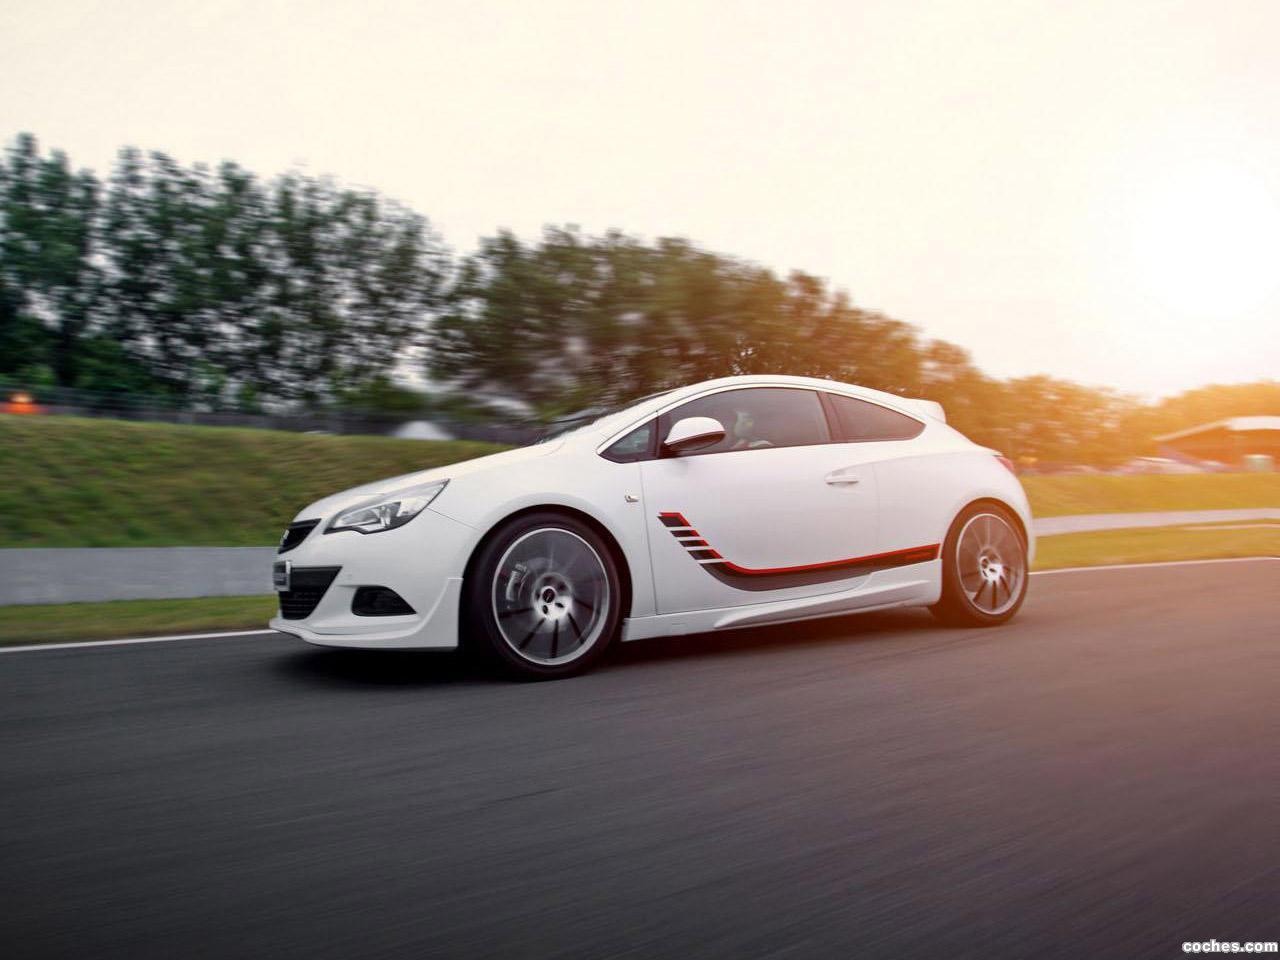 Foto 1 de Irmscher Opel Astra GTC Turbo I 1400 2014